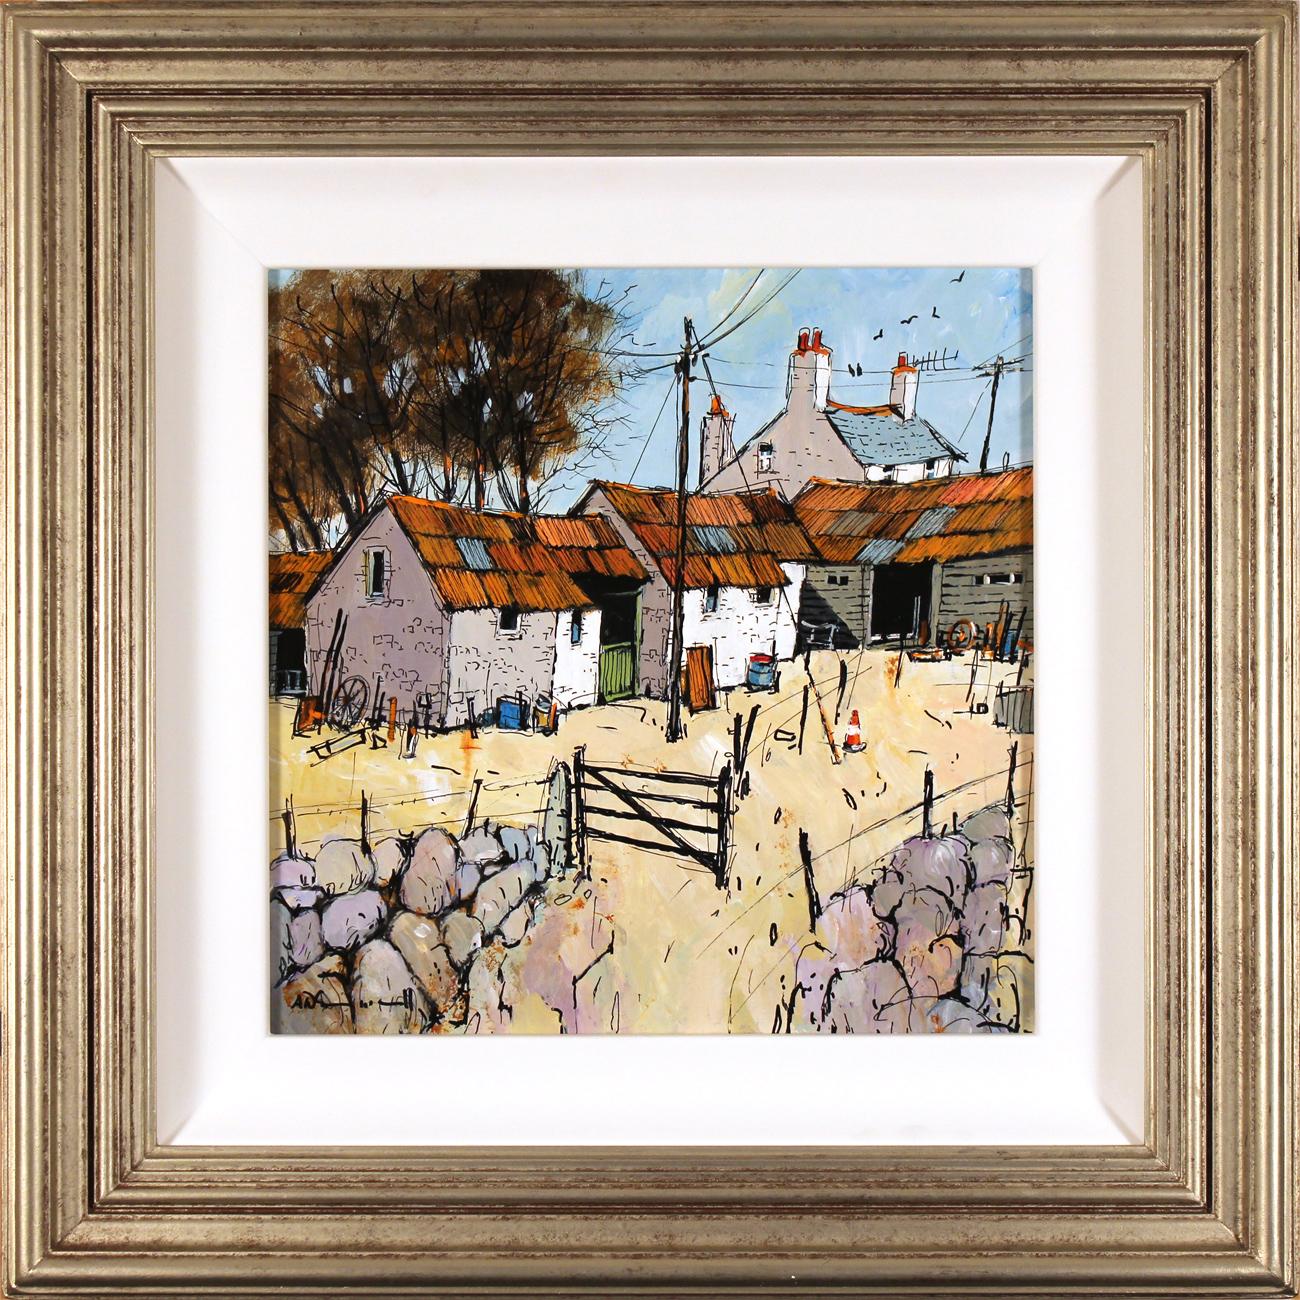 Alan Smith, Original acrylic painting on board, Farmyard Flurry Click to enlarge